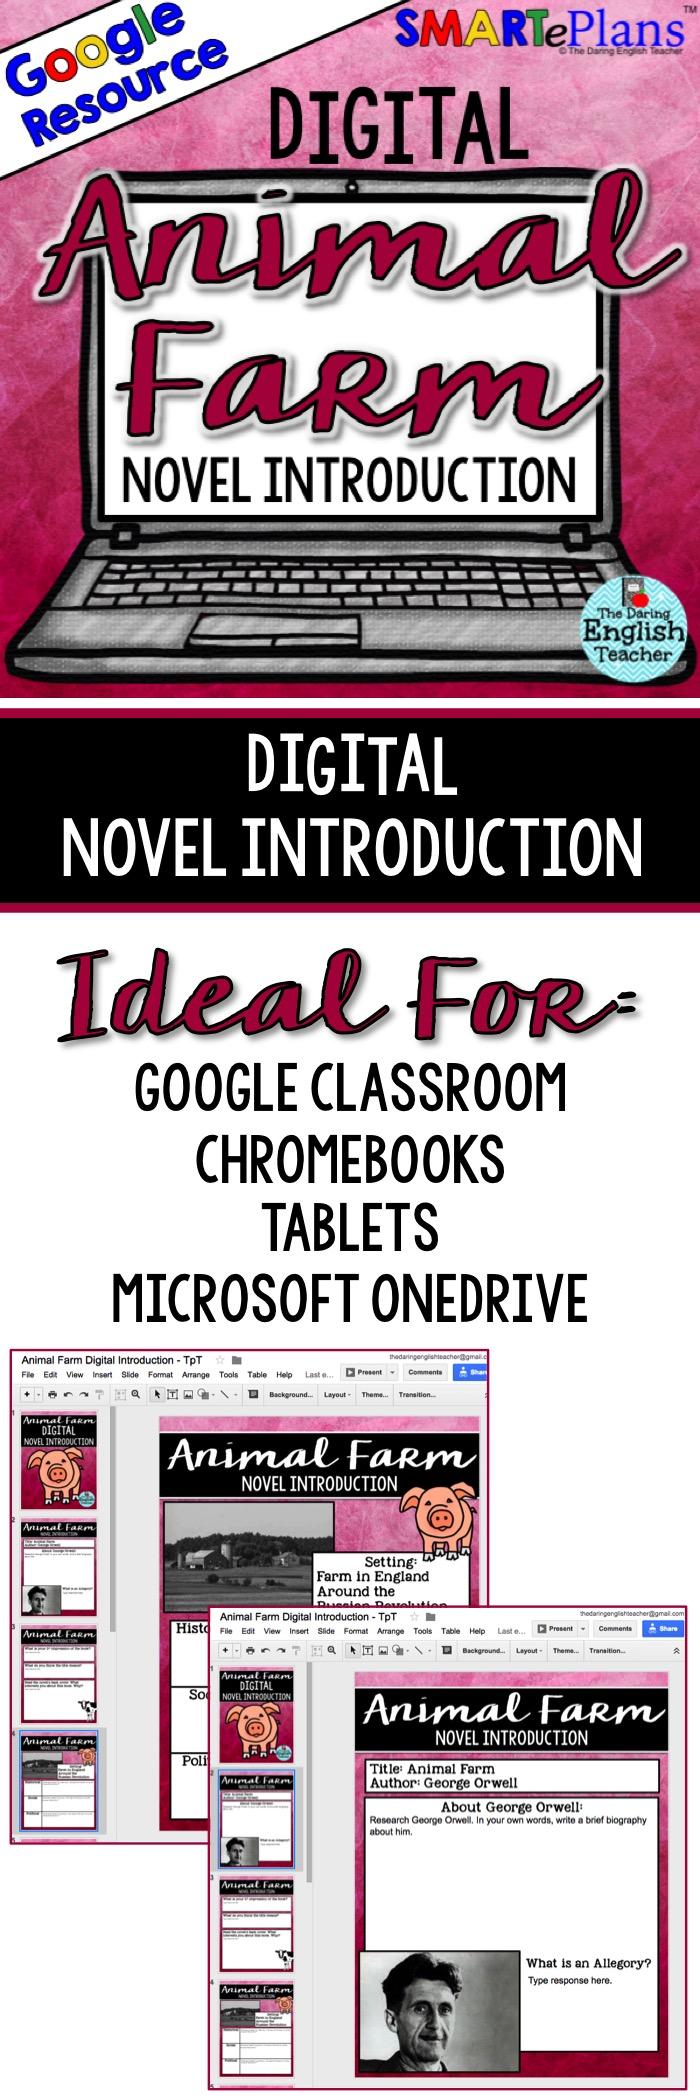 Digital Animal Farm Novel Introduction for Google Drive